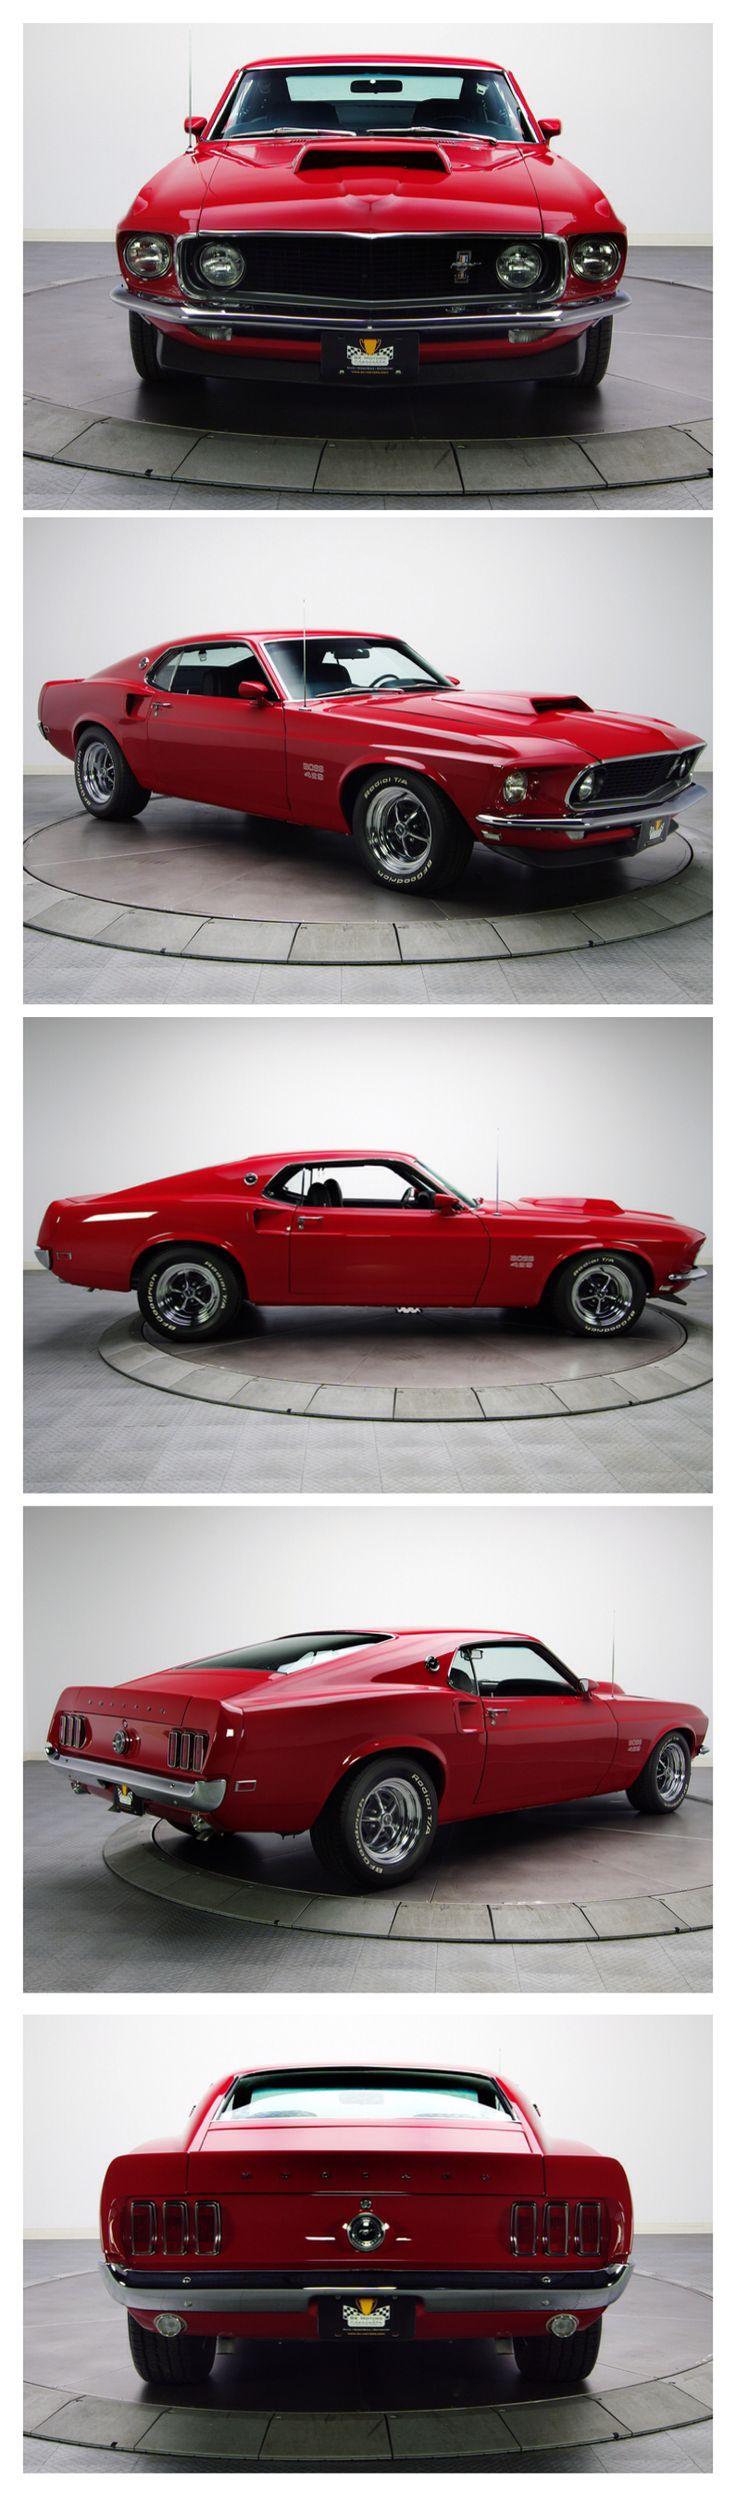 1969 Ford Mustang BOSS 429 Visit http://www.holmestuttle.com/